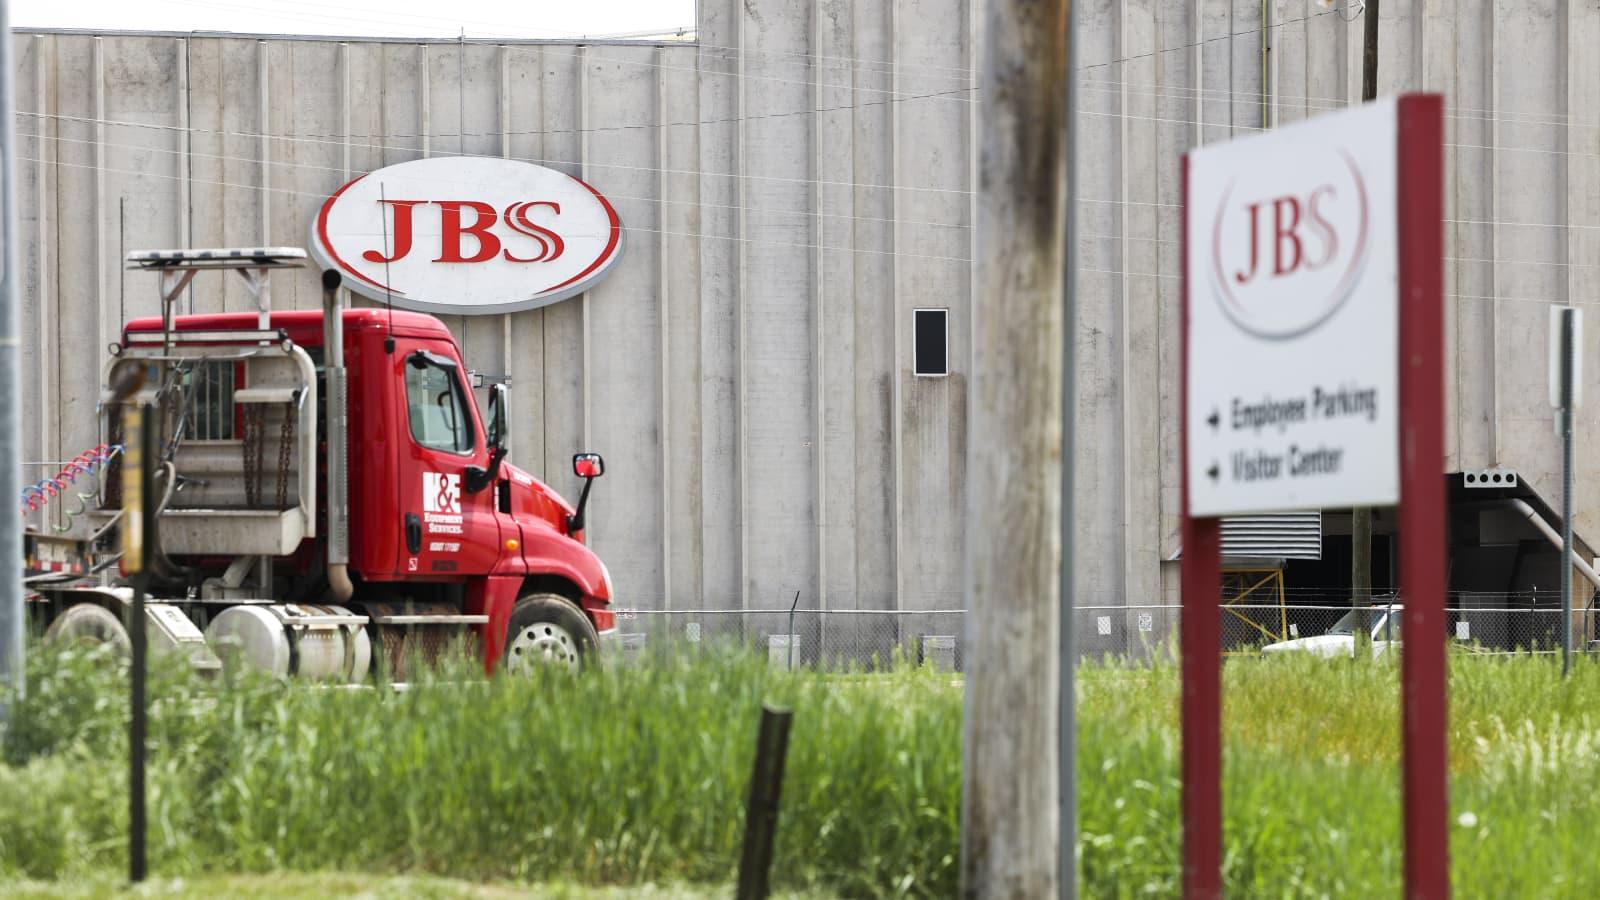 JBS Meat Supplier Pay $ 11 Million to Ransomware Striker